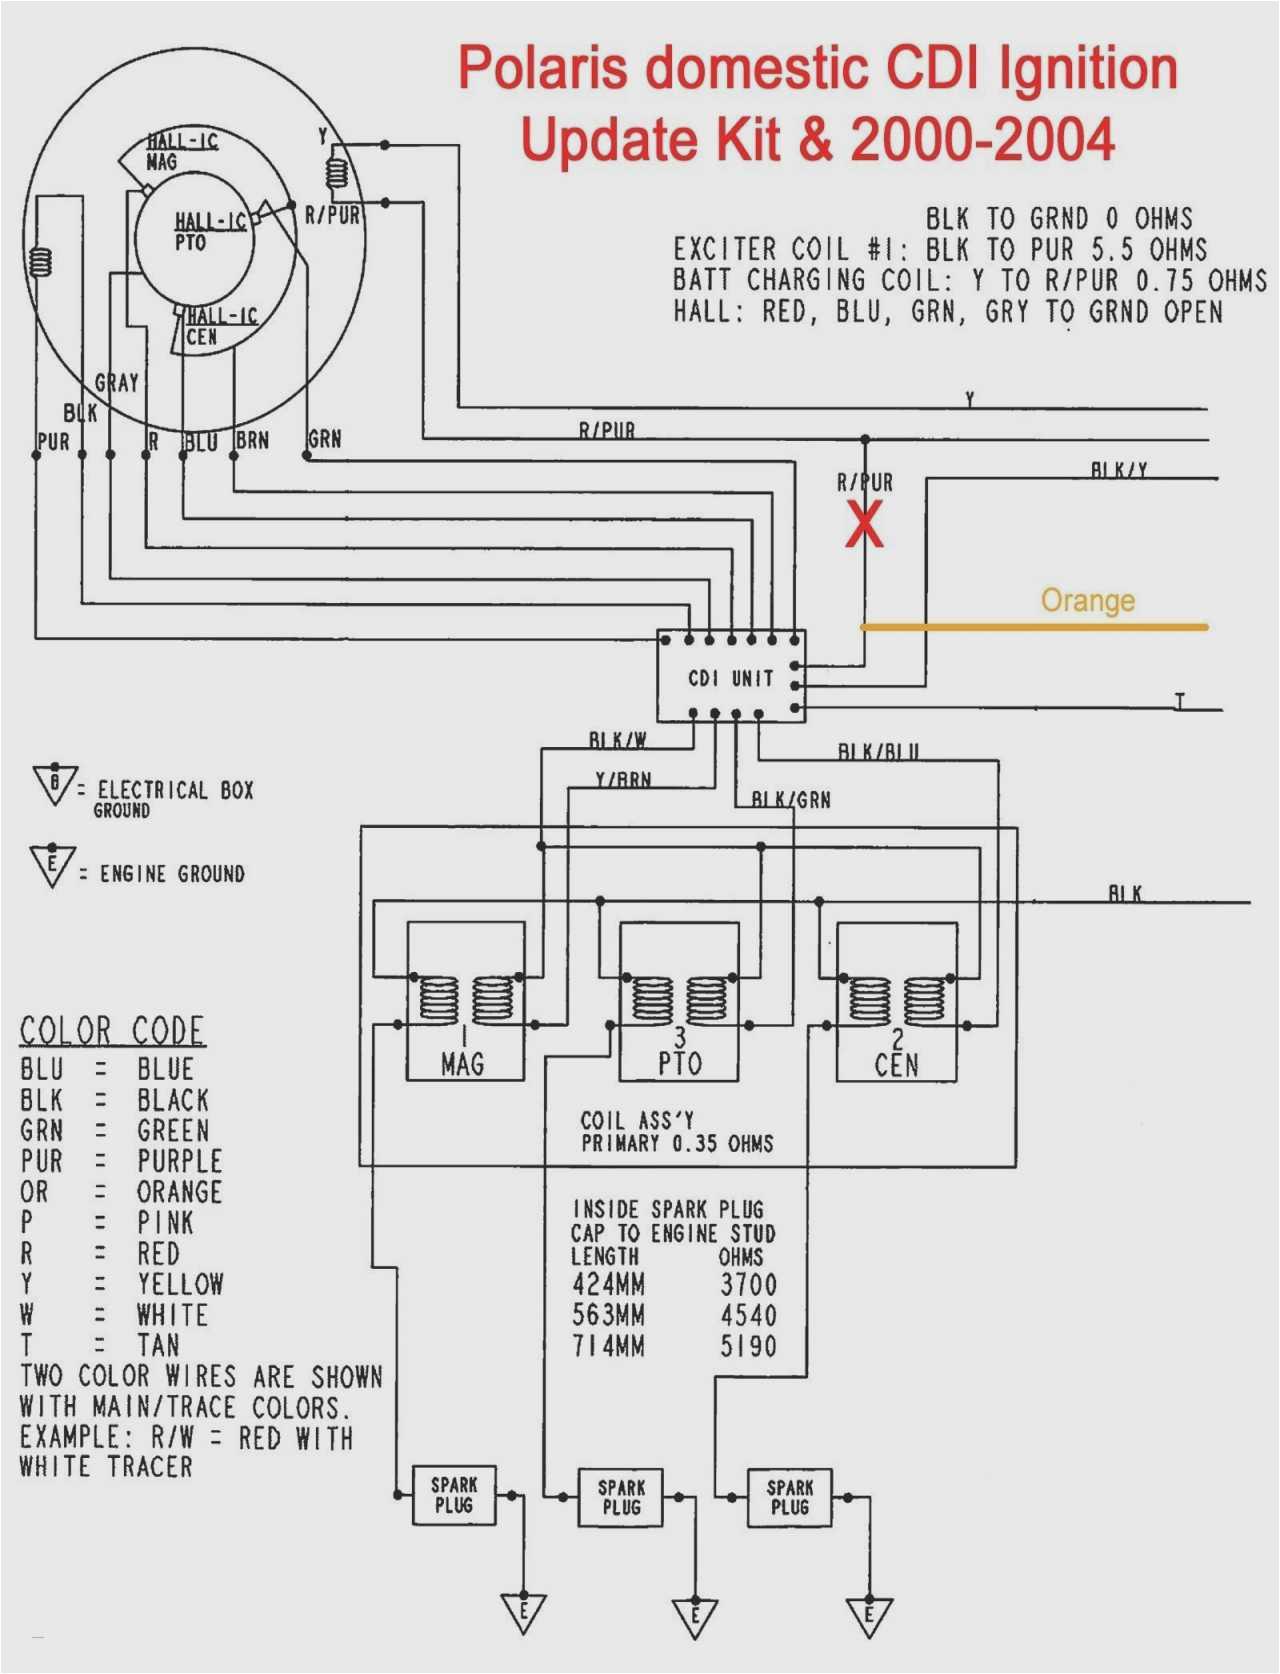 polaris 200 wiring diagram free download schematic data diagram 2006 polaris phoenix 200 wiring diagram polaris 200 wiring diagram